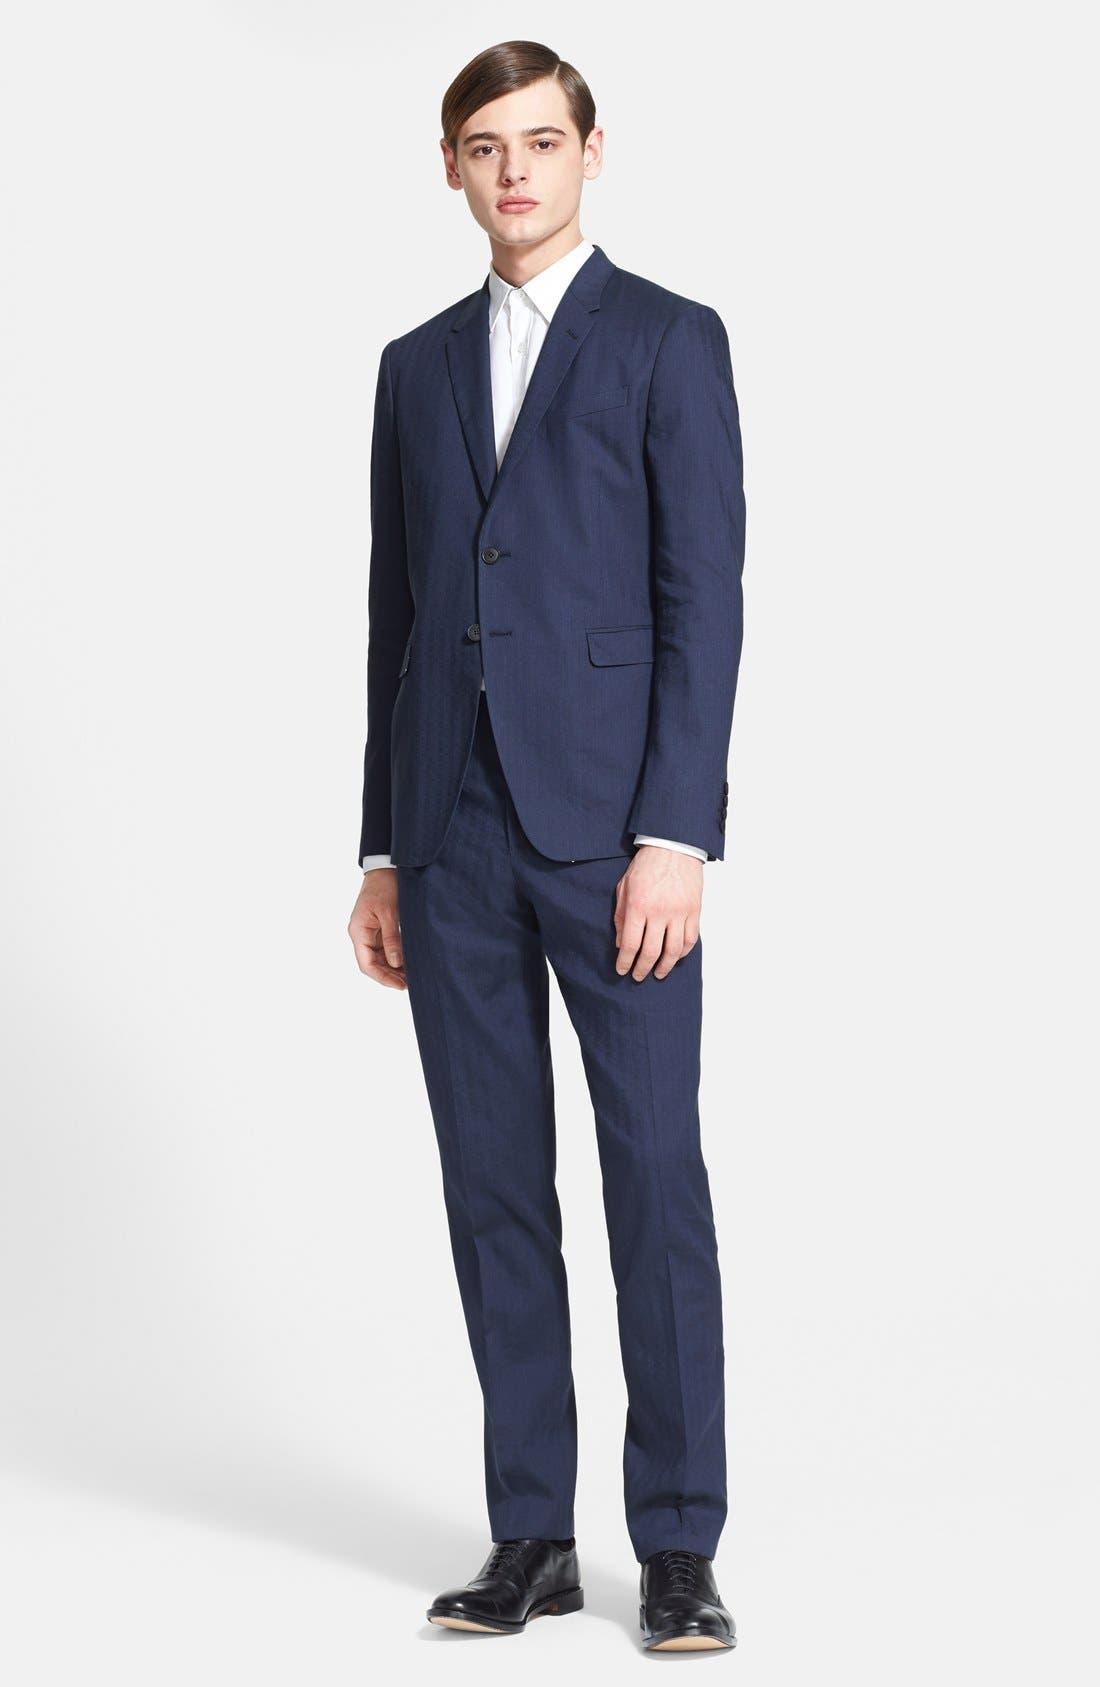 Alternate Image 1 Selected - Paul Smith London 'Kensington' Dot Check Linen Blend Suit